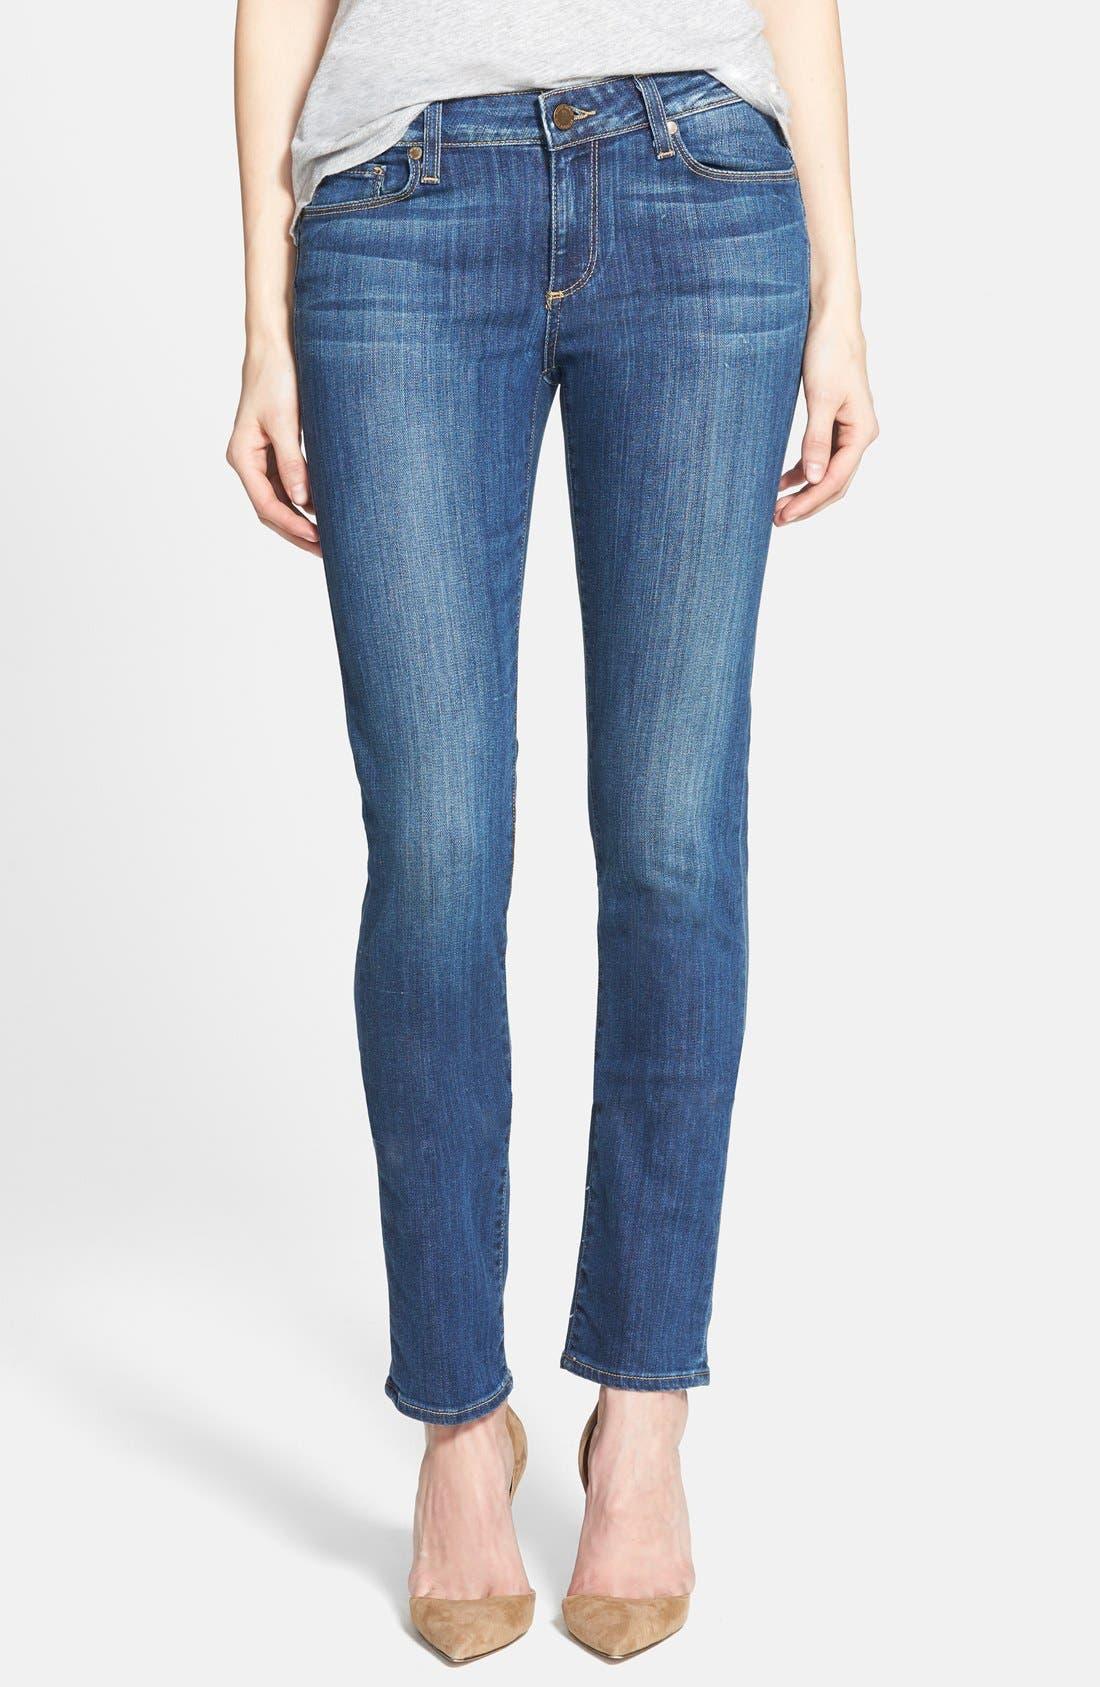 Alternate Image 1 Selected - Paige Denim 'Skyline' Skinny Jeans (Orson Blue)